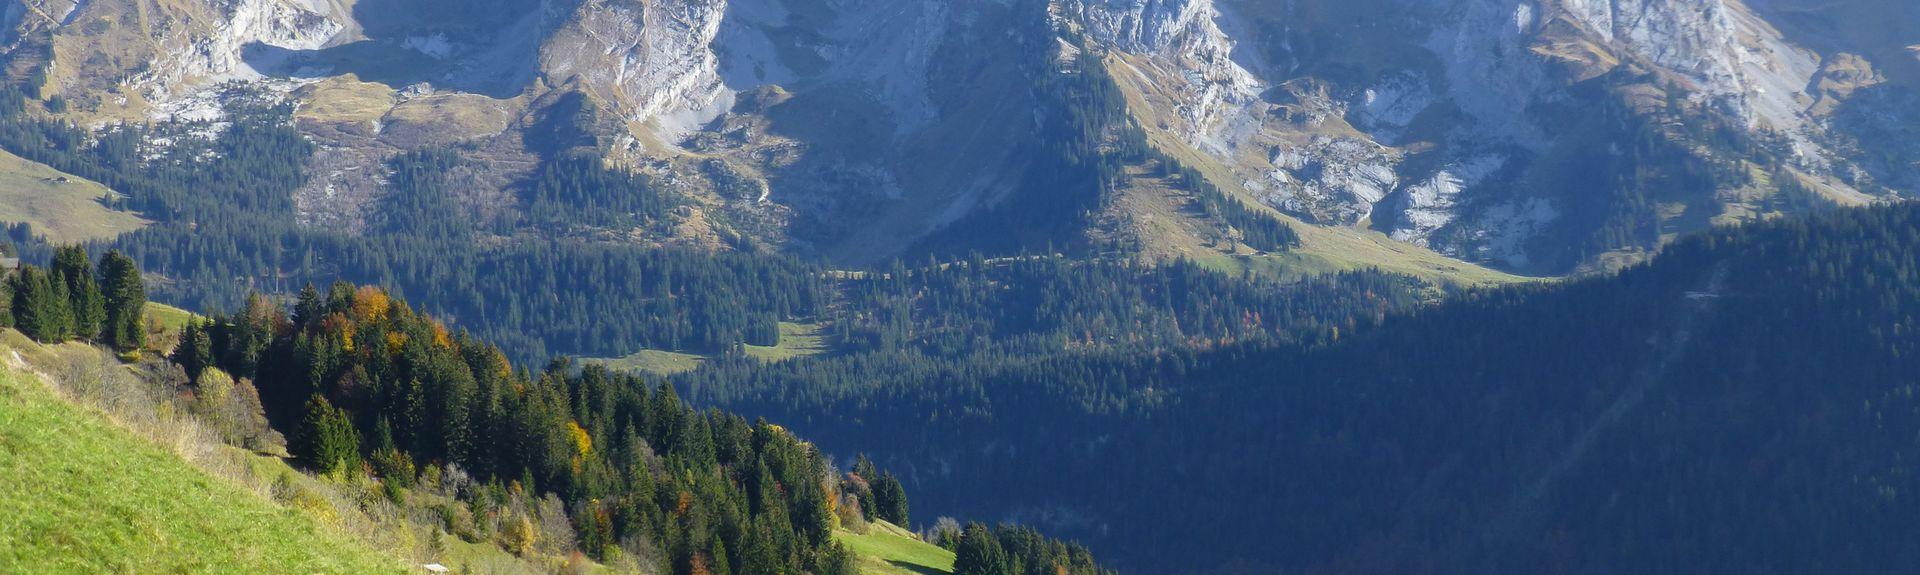 Serraval, Alvernia-Rodano-Alpi, Francia